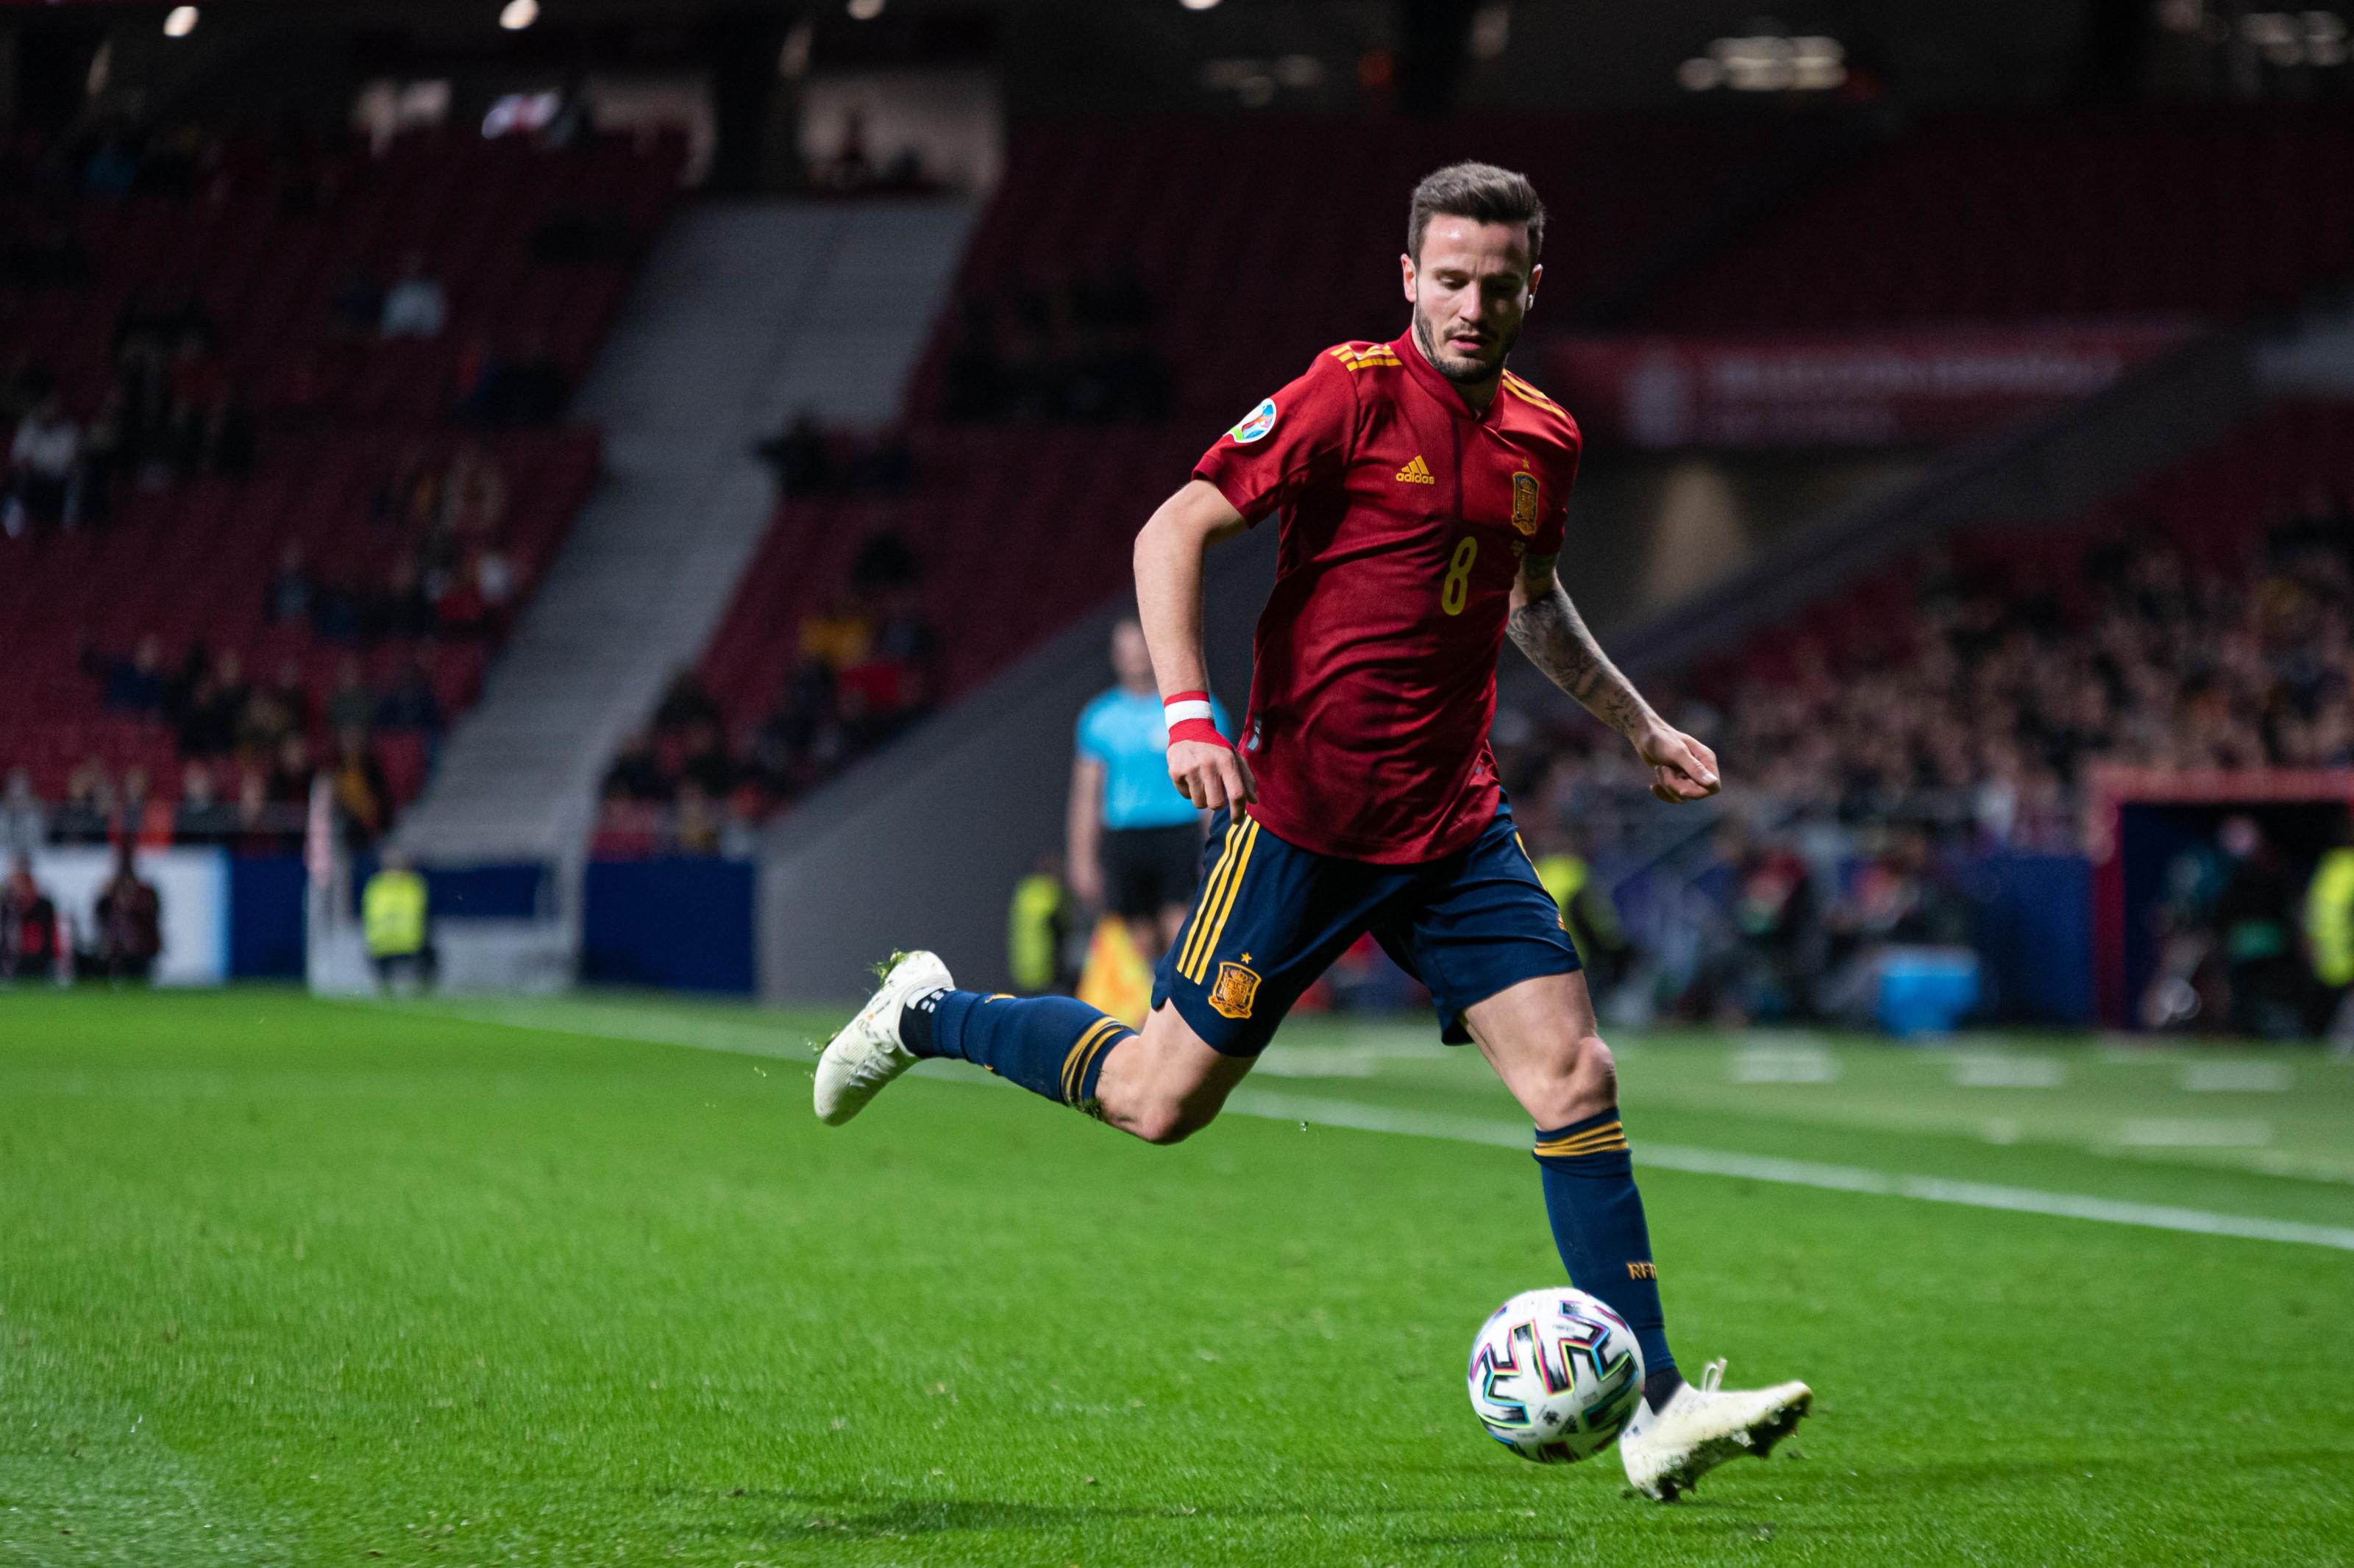 Manchester United set to make £70m bid for world-class midfielder